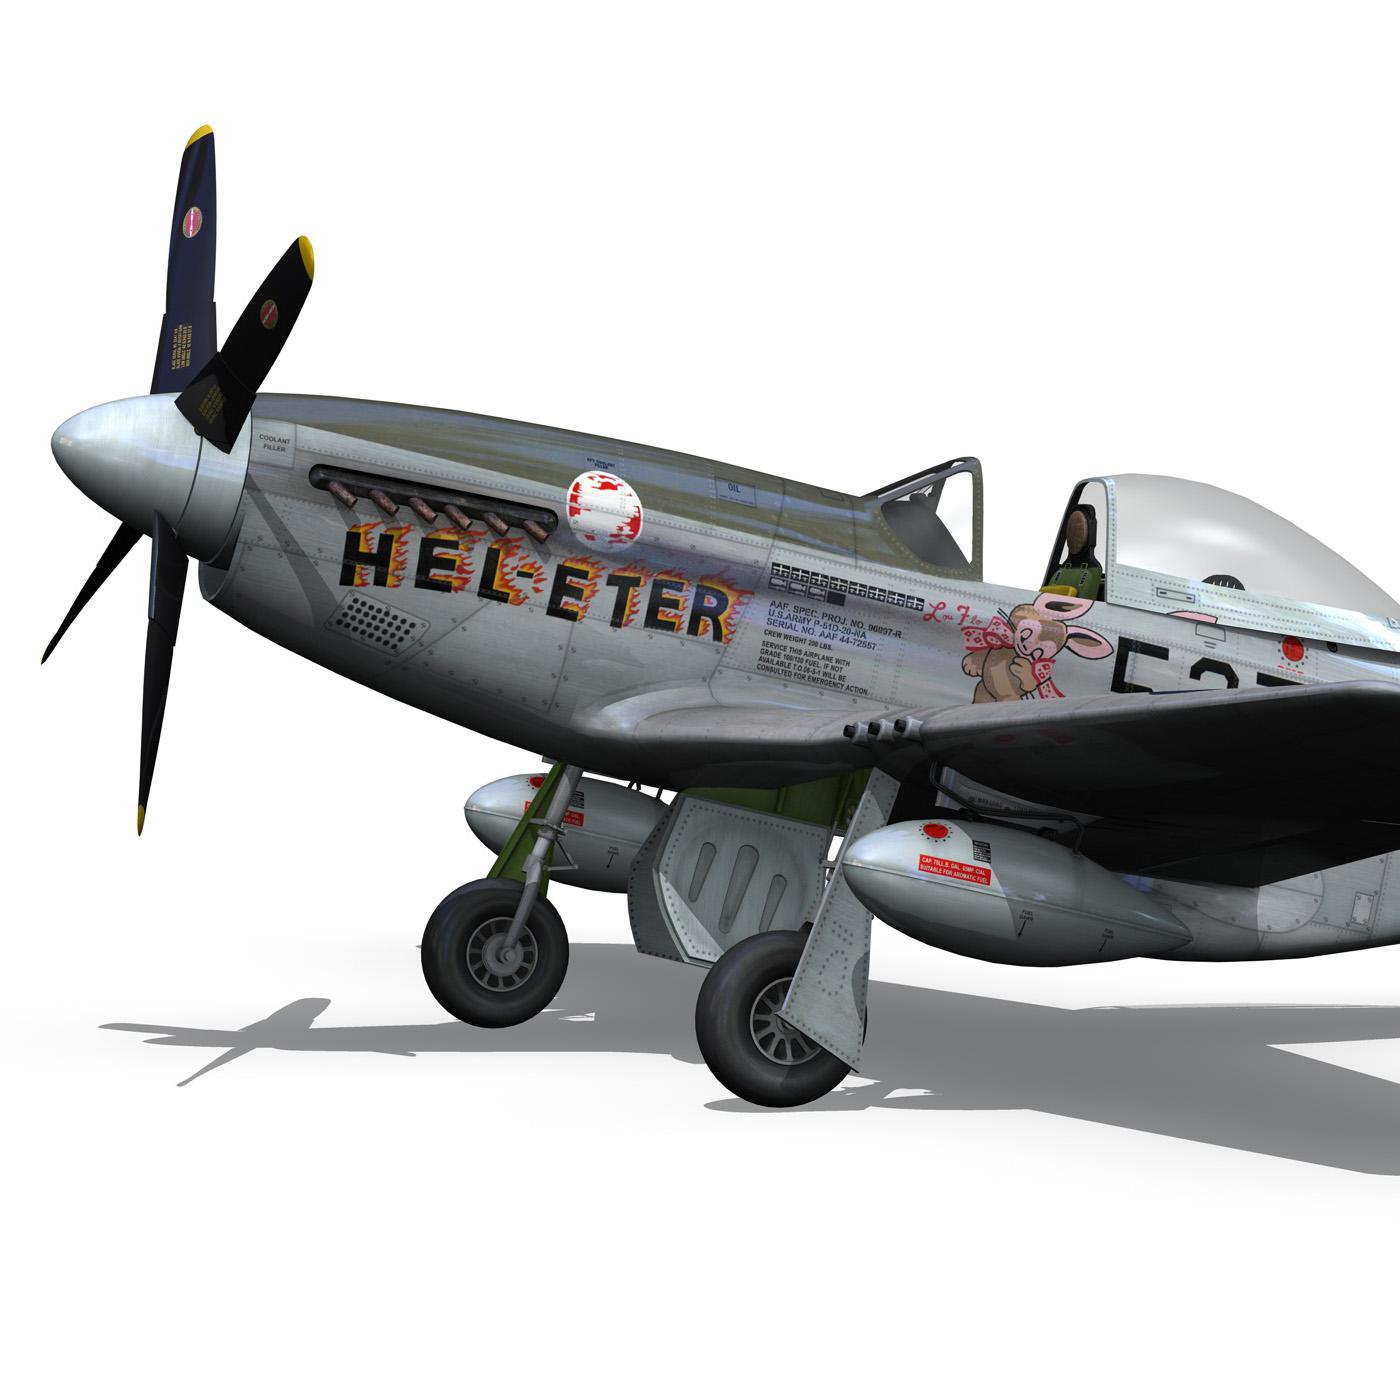 north american p-51d – mustang – heleter 3d model fbx c4d lwo obj 267548